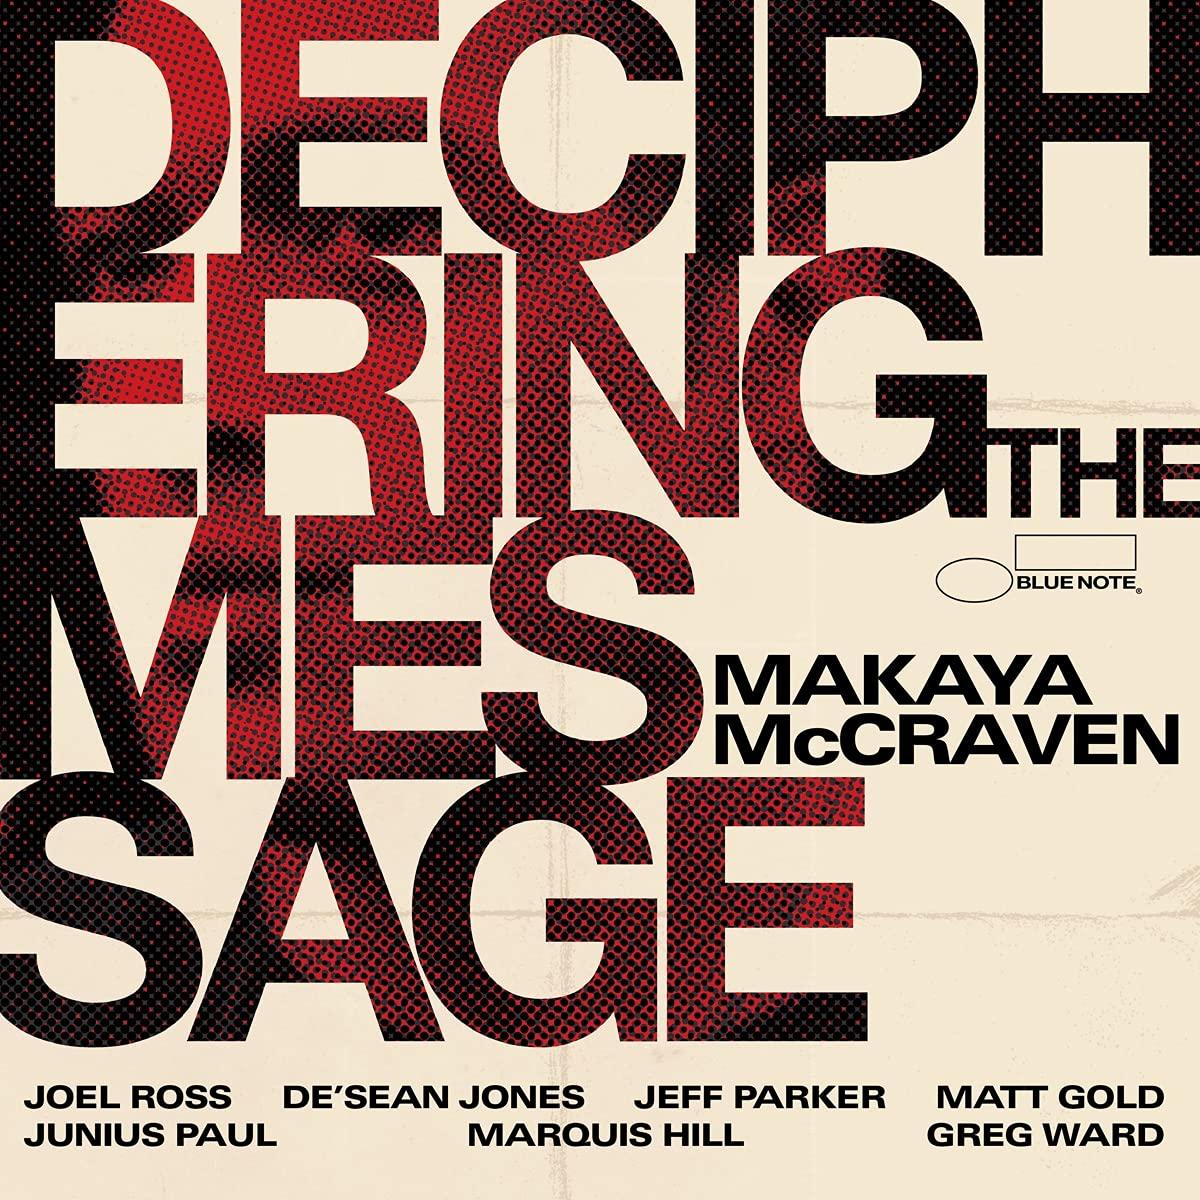 Makaya Mccraven |Deciphering The Message